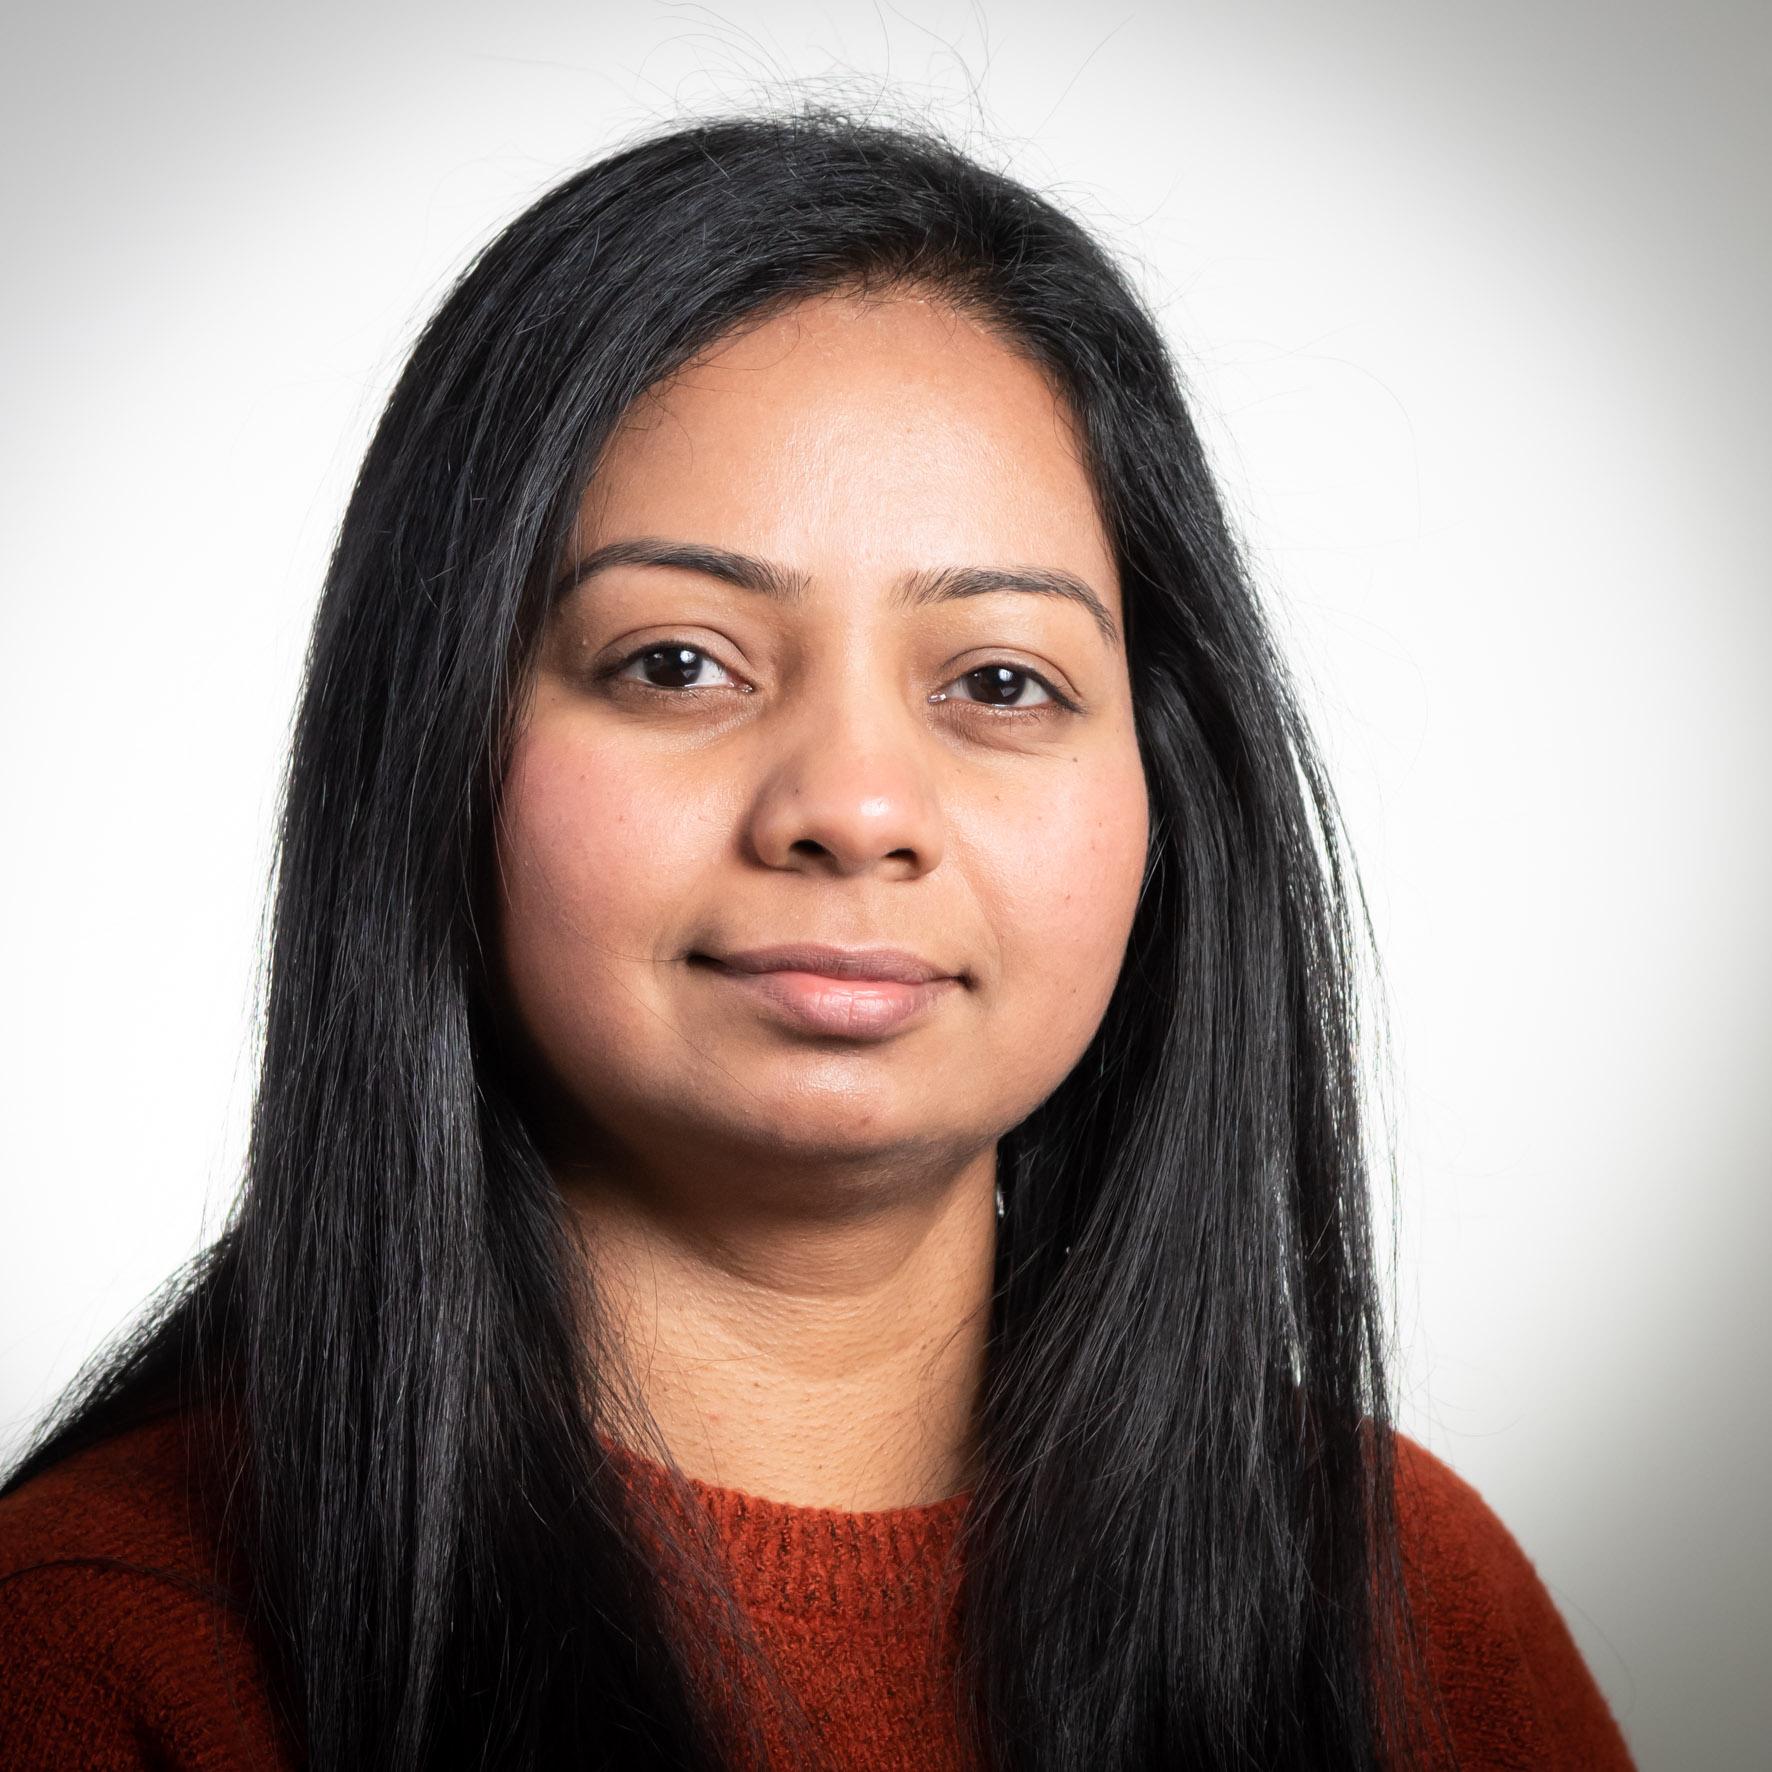 Iromie Rajaratnam profile picture photograph